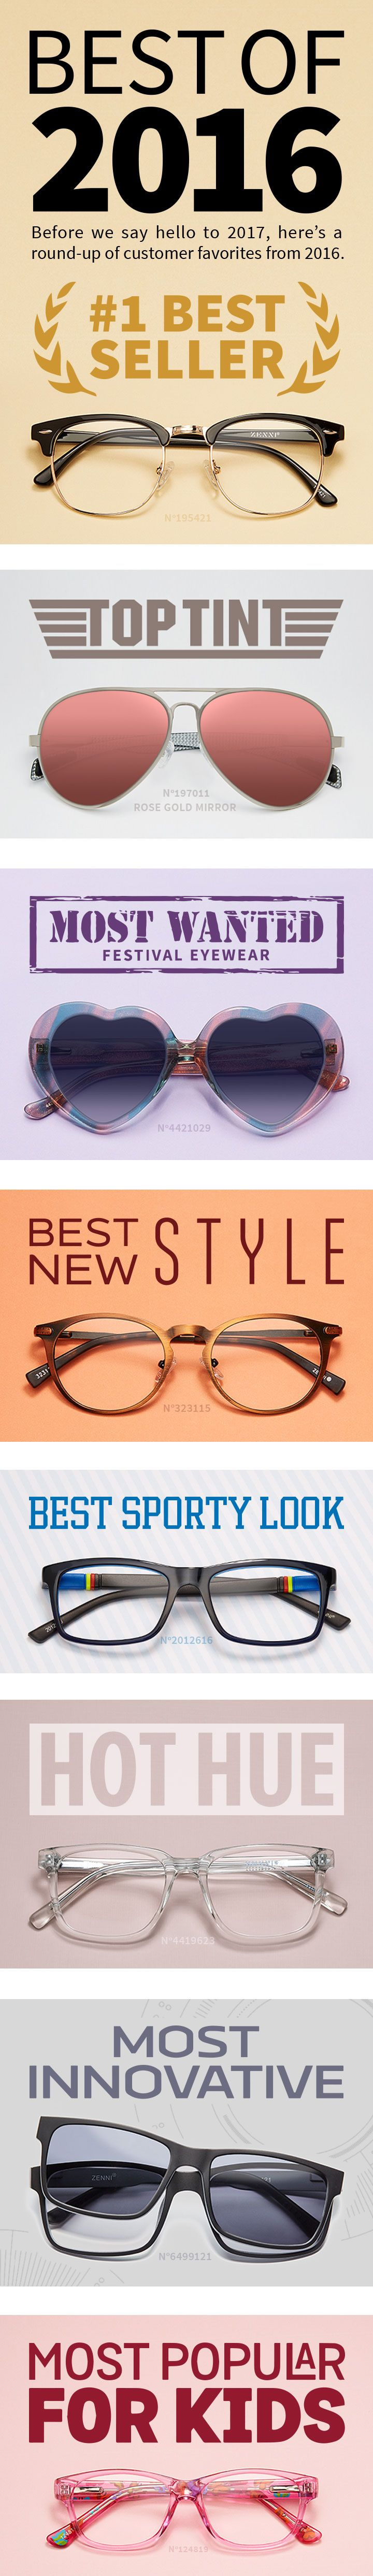 29 best Sunglasses Eyeglasses Safety Glasses images on Pinterest ...